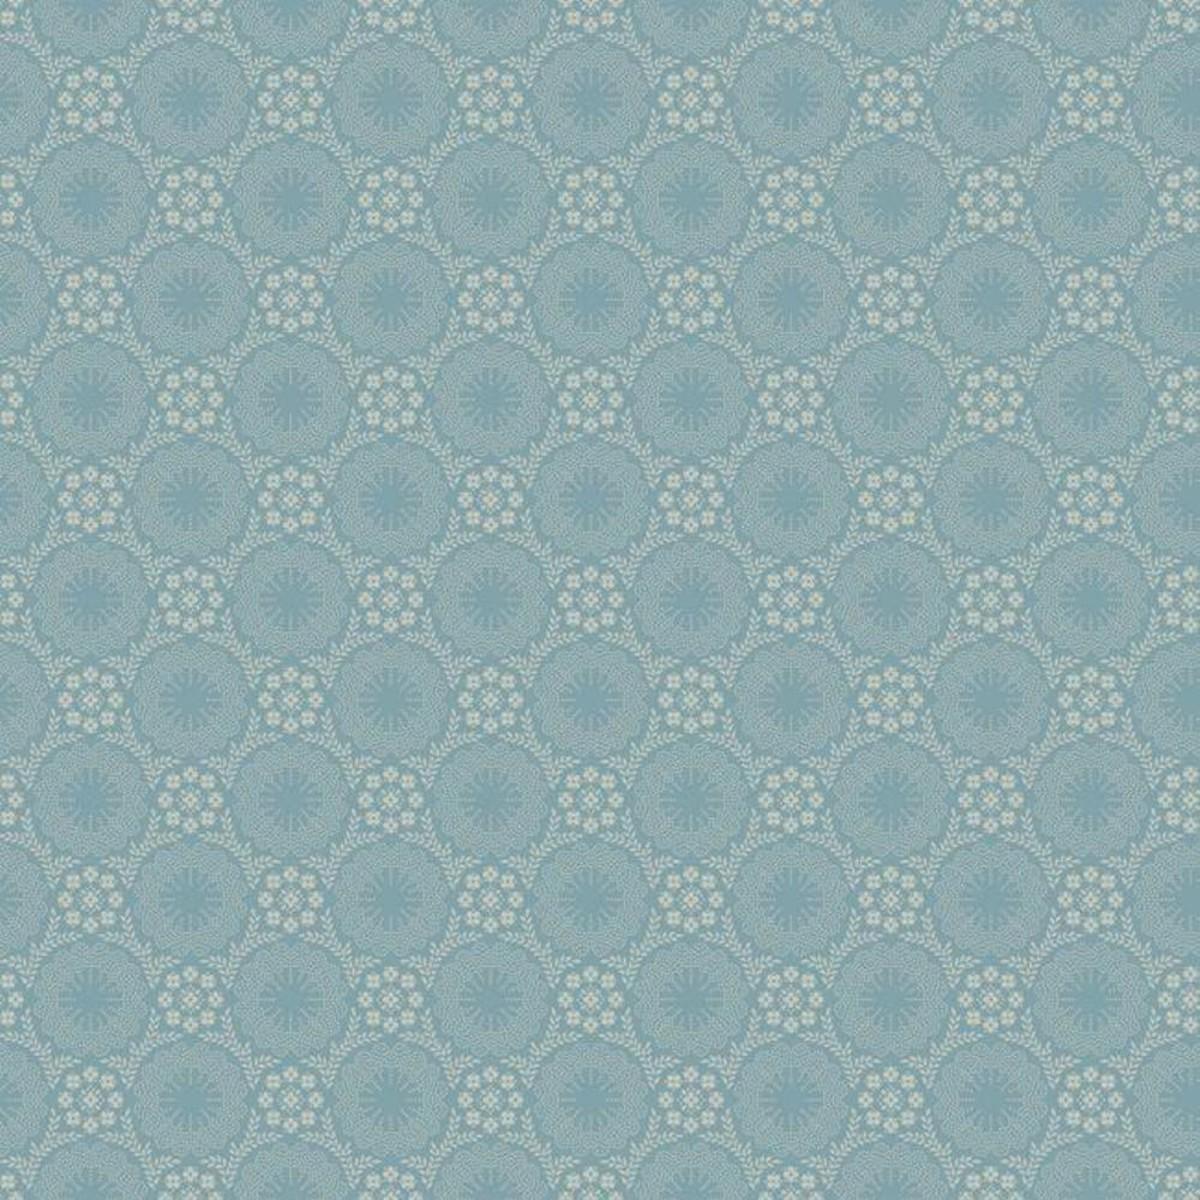 Обои бумажные York Wallcoverings Williamsburg III синие GS6290 0.52 м